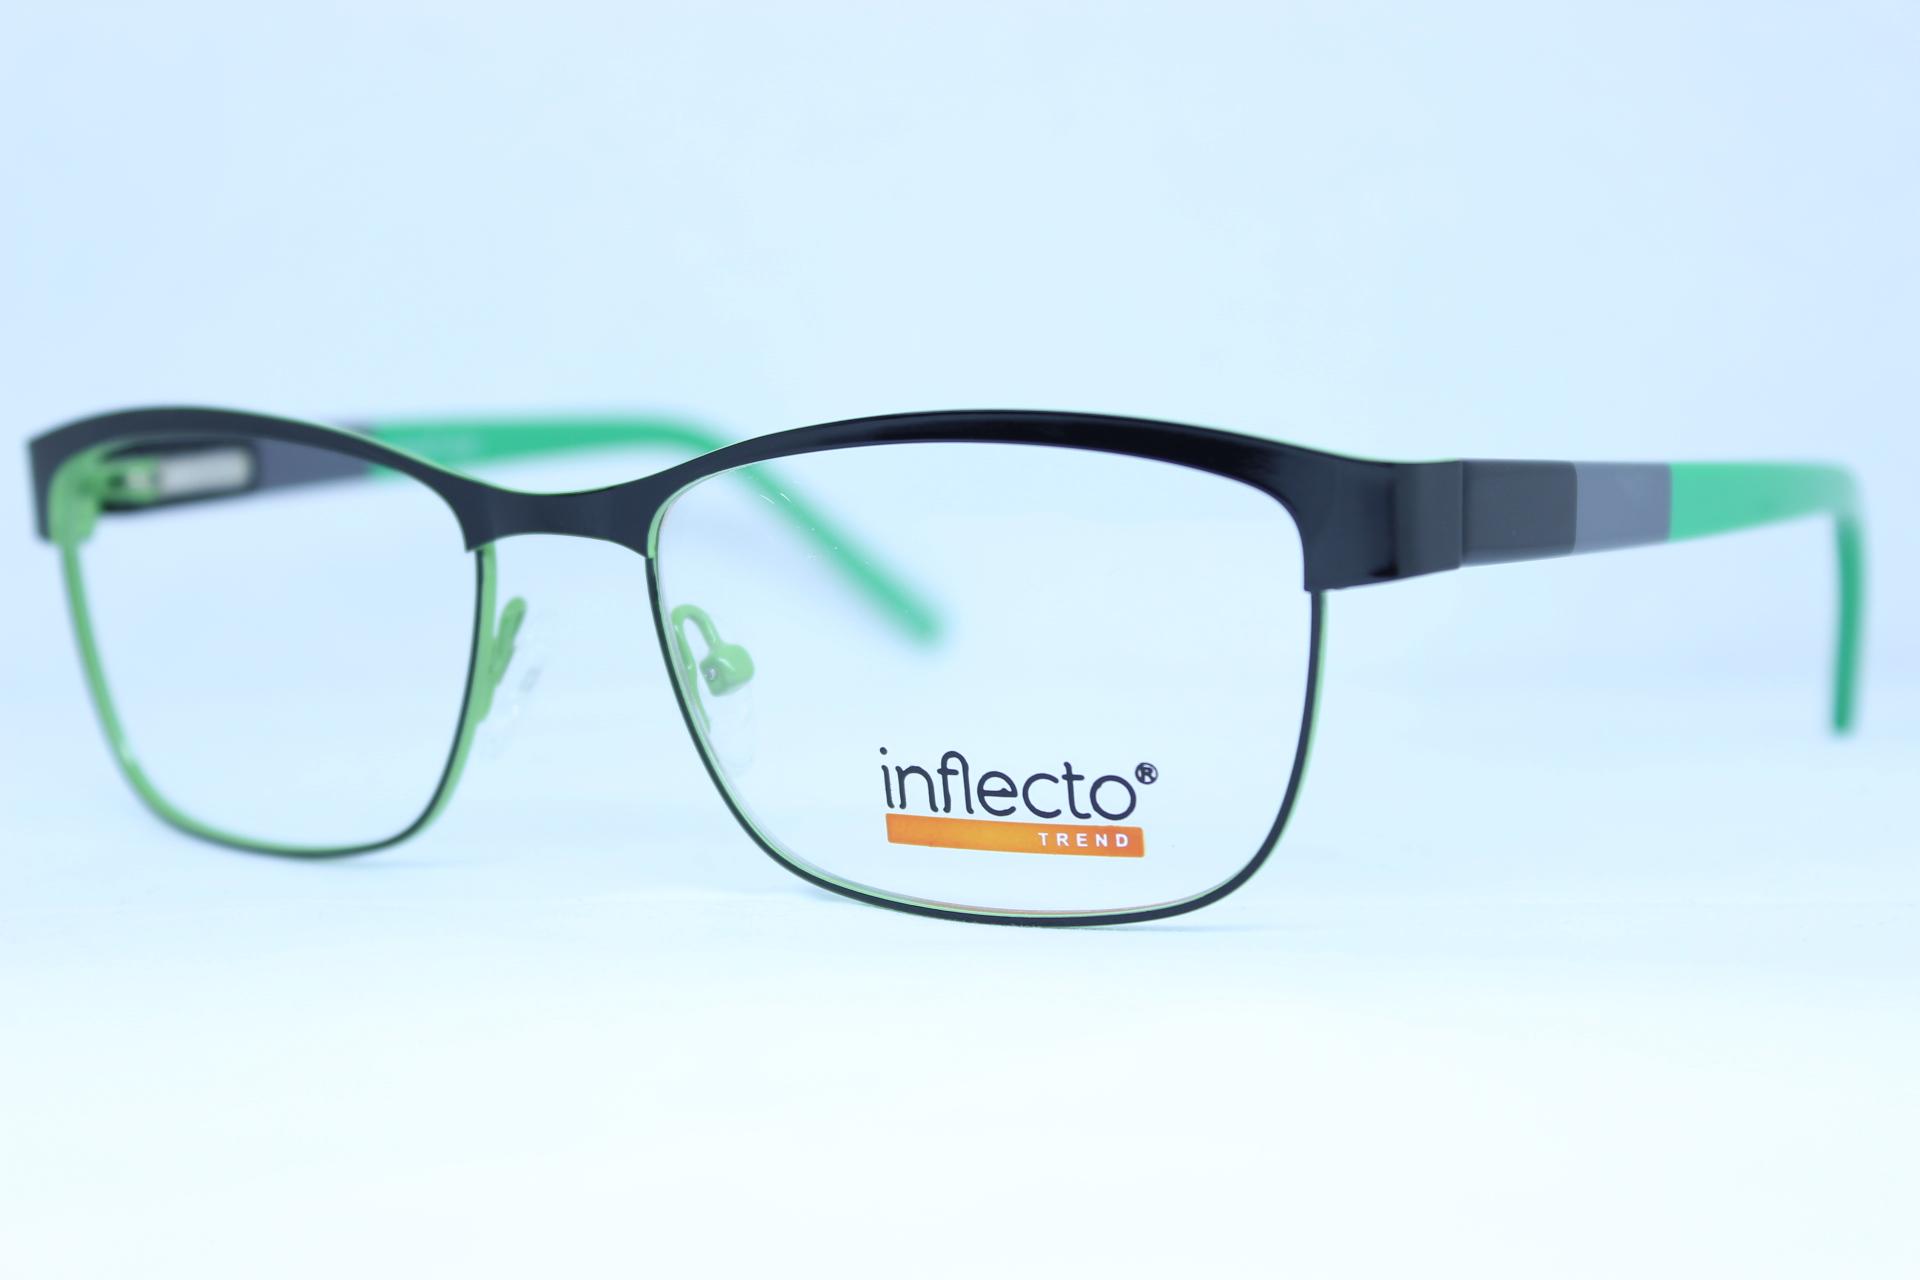 8039058df Inflecto ITE088 50-18 C3 - Vidioptika